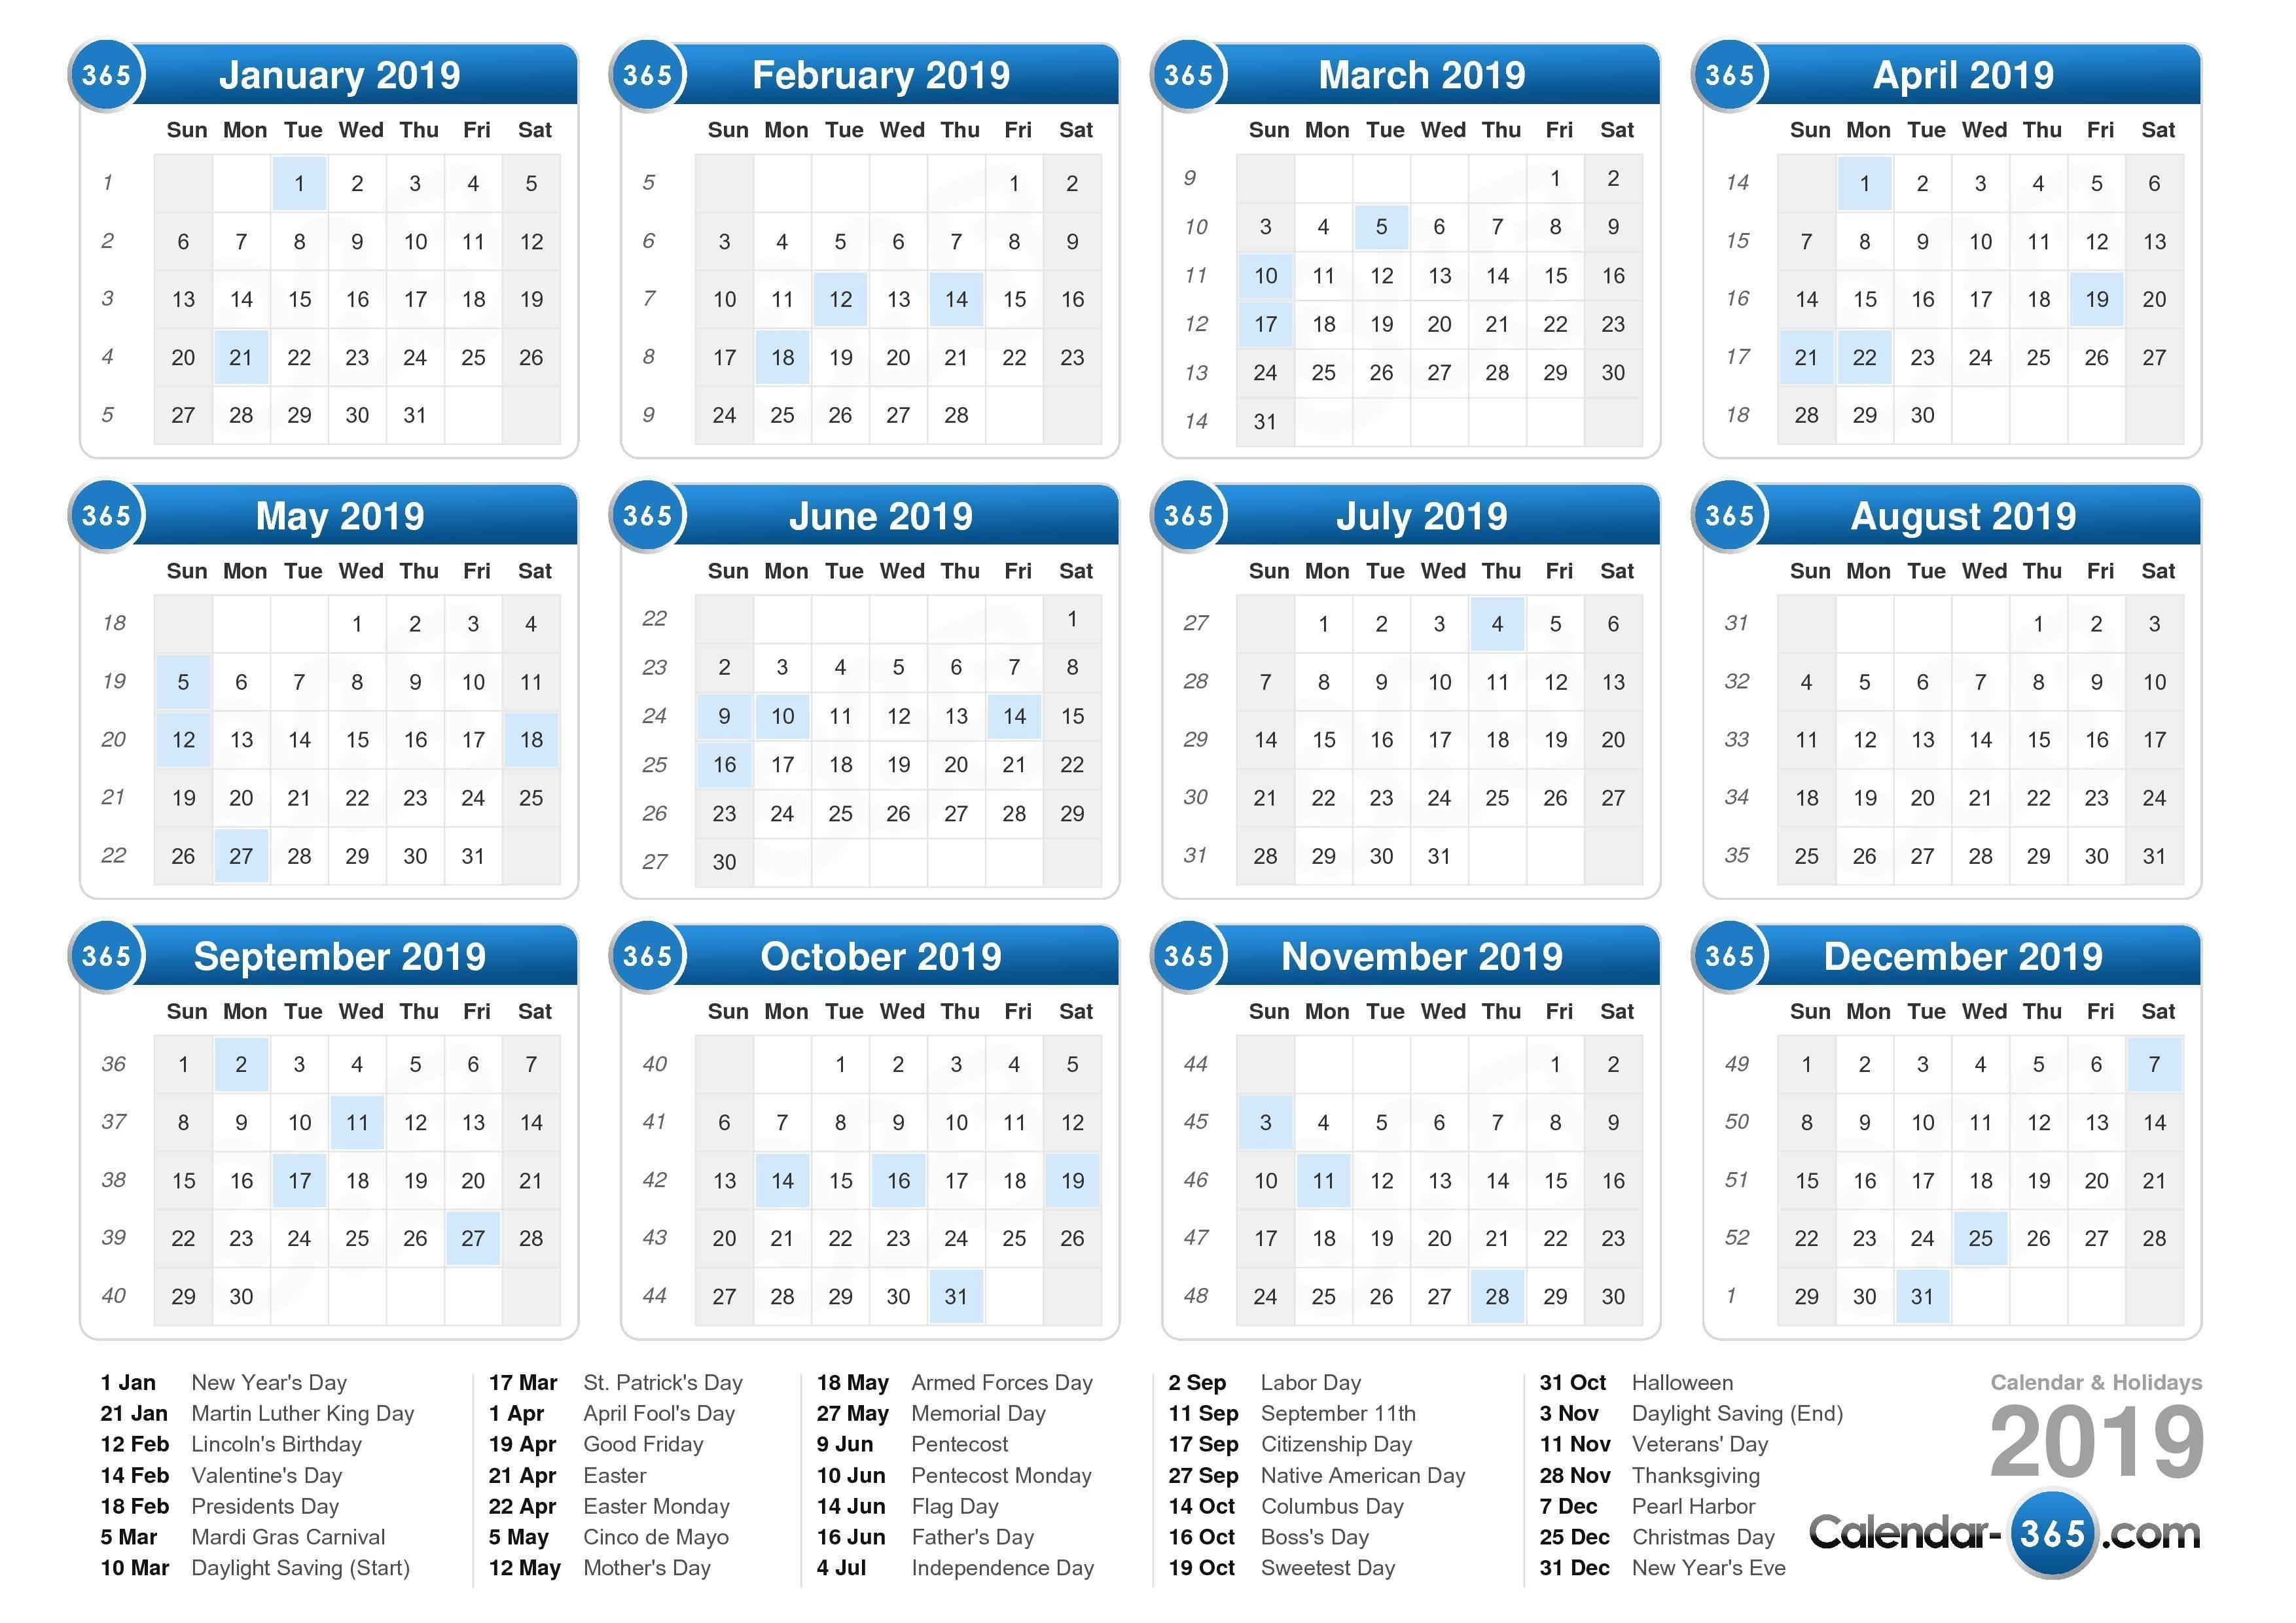 2019 Calendar Calendar 2019 In Weeks